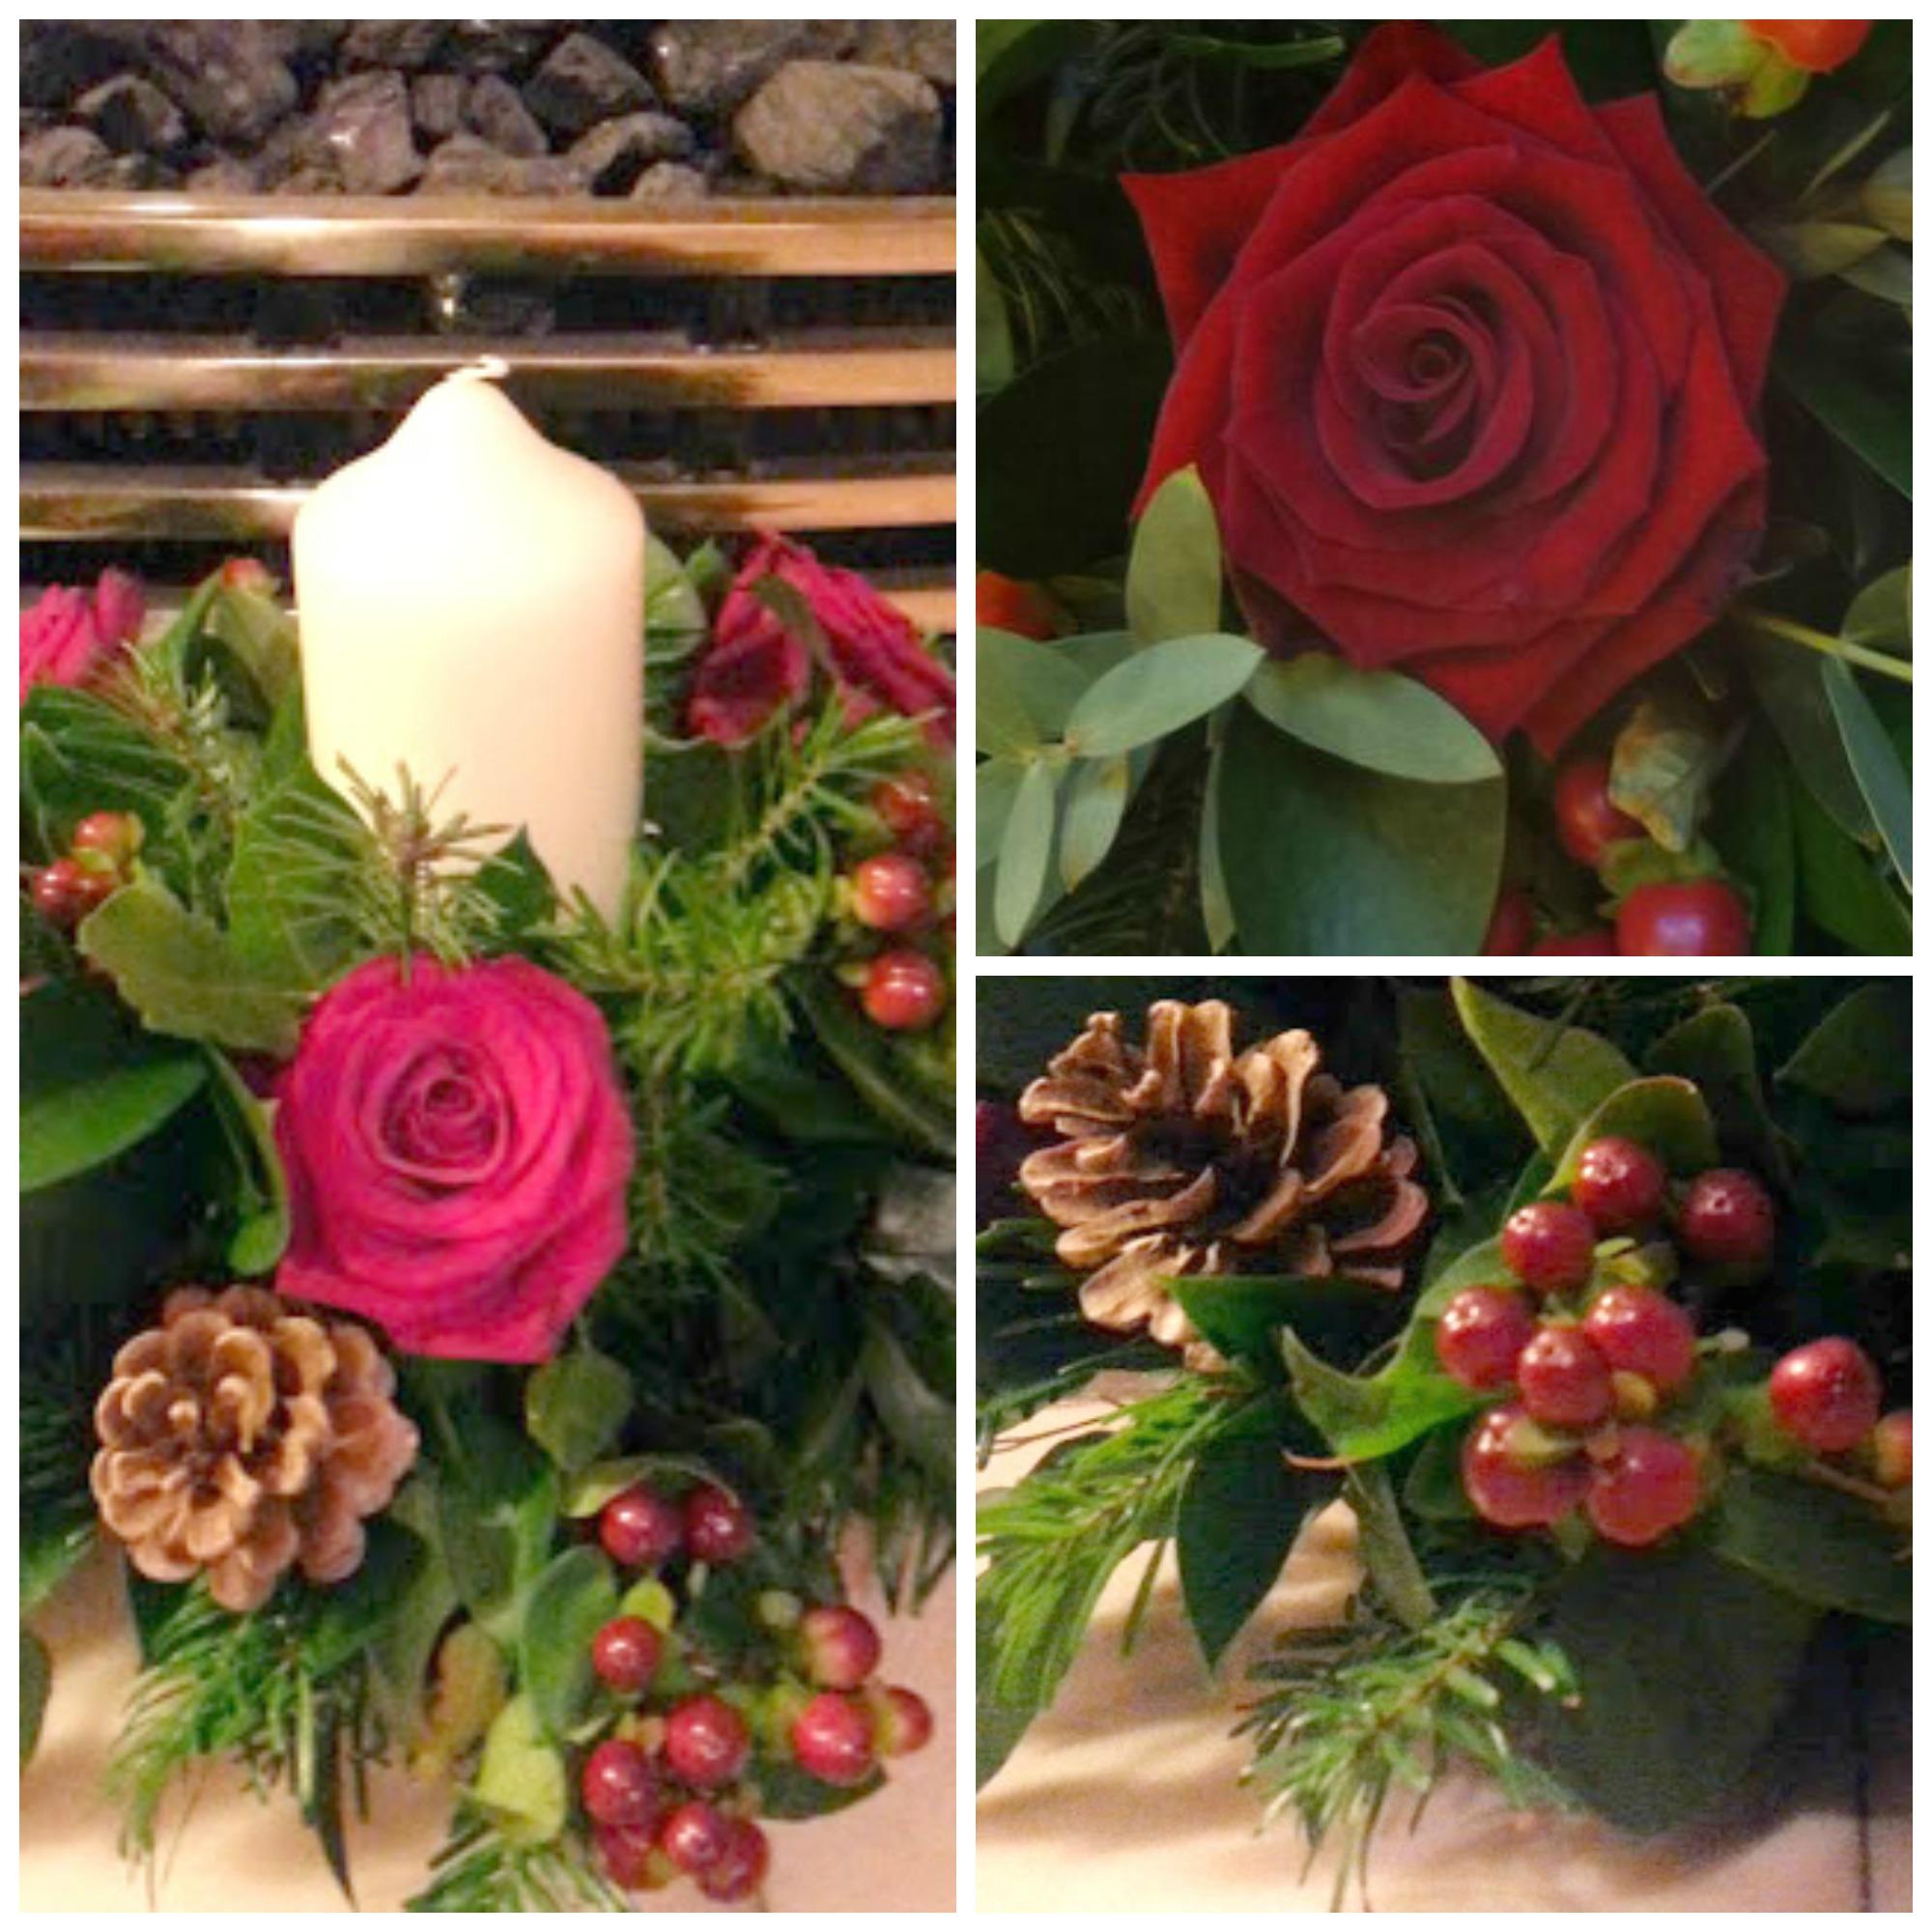 40 per cent off appleyard london flowers discount code for Fresh design blog